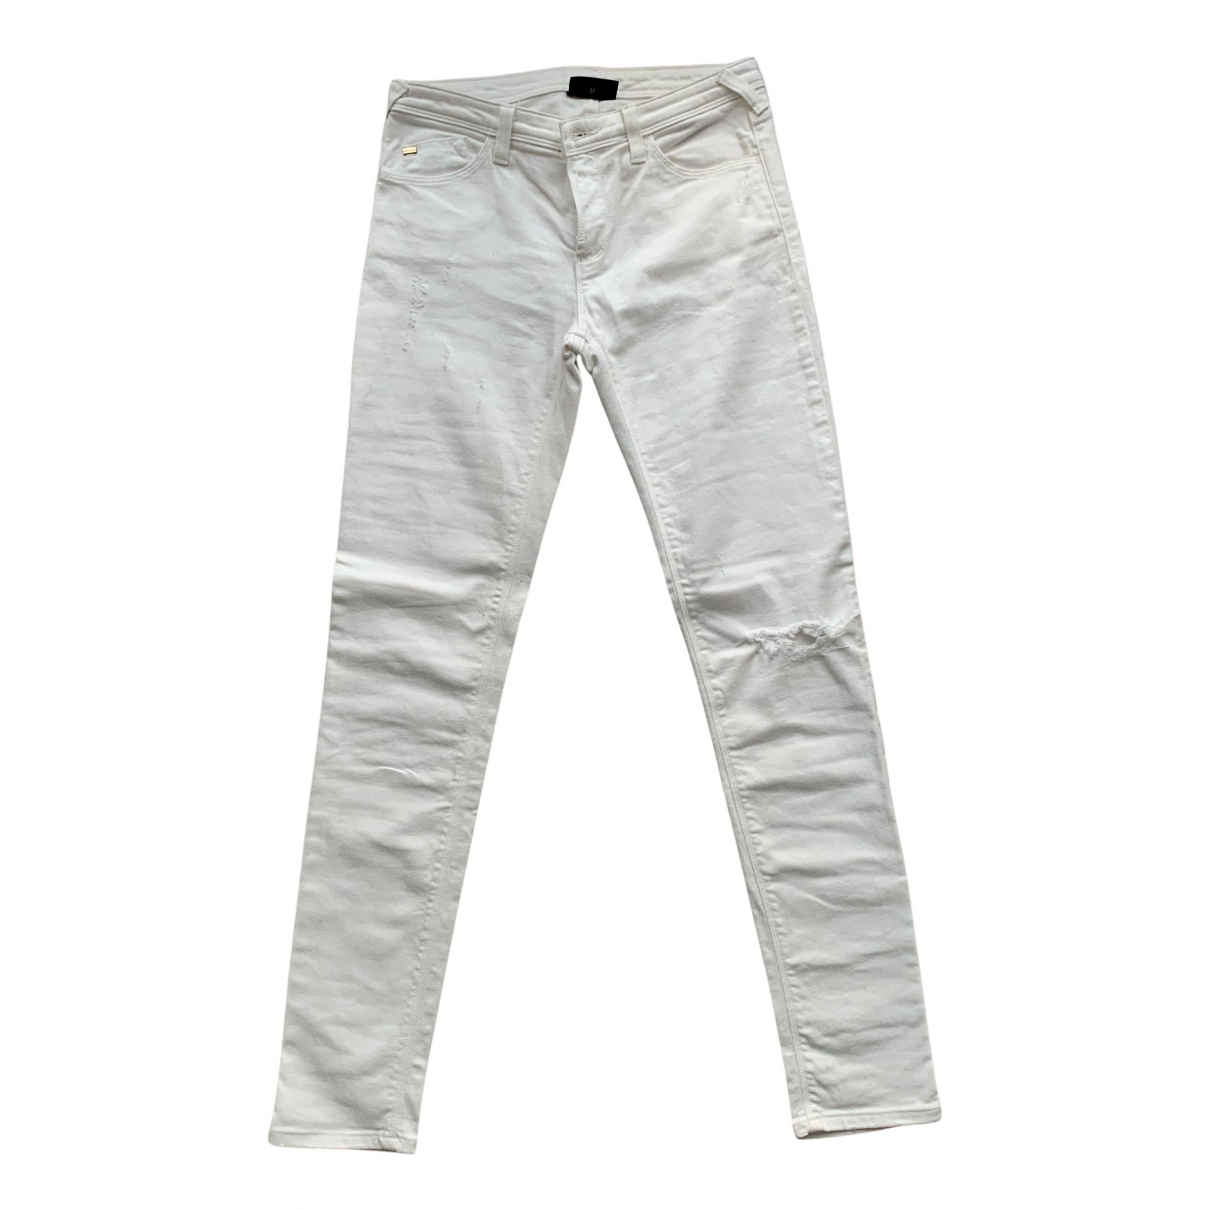 Armani Jeans N White Cotton - elasthane Jeans for Women 28 US